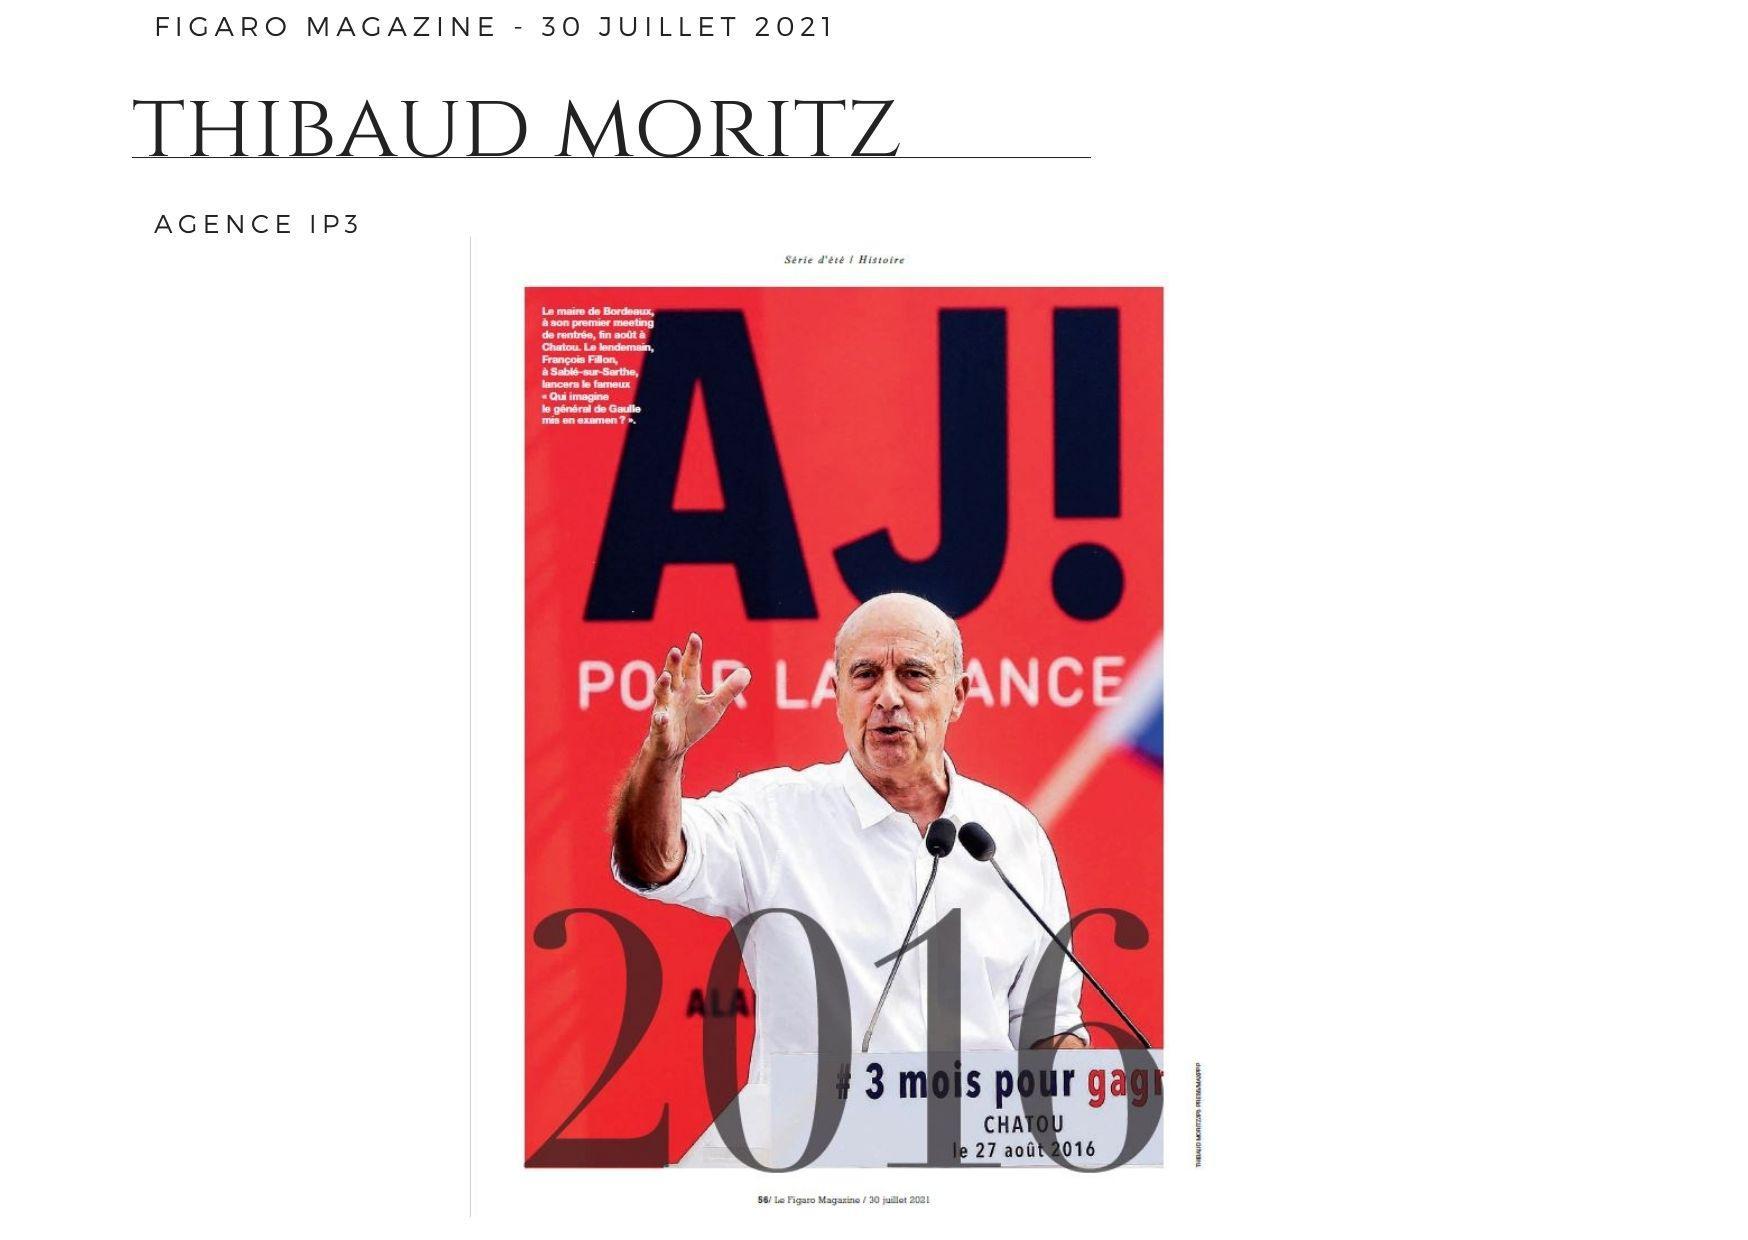 Figaro Magazine - 30 juillet 2021